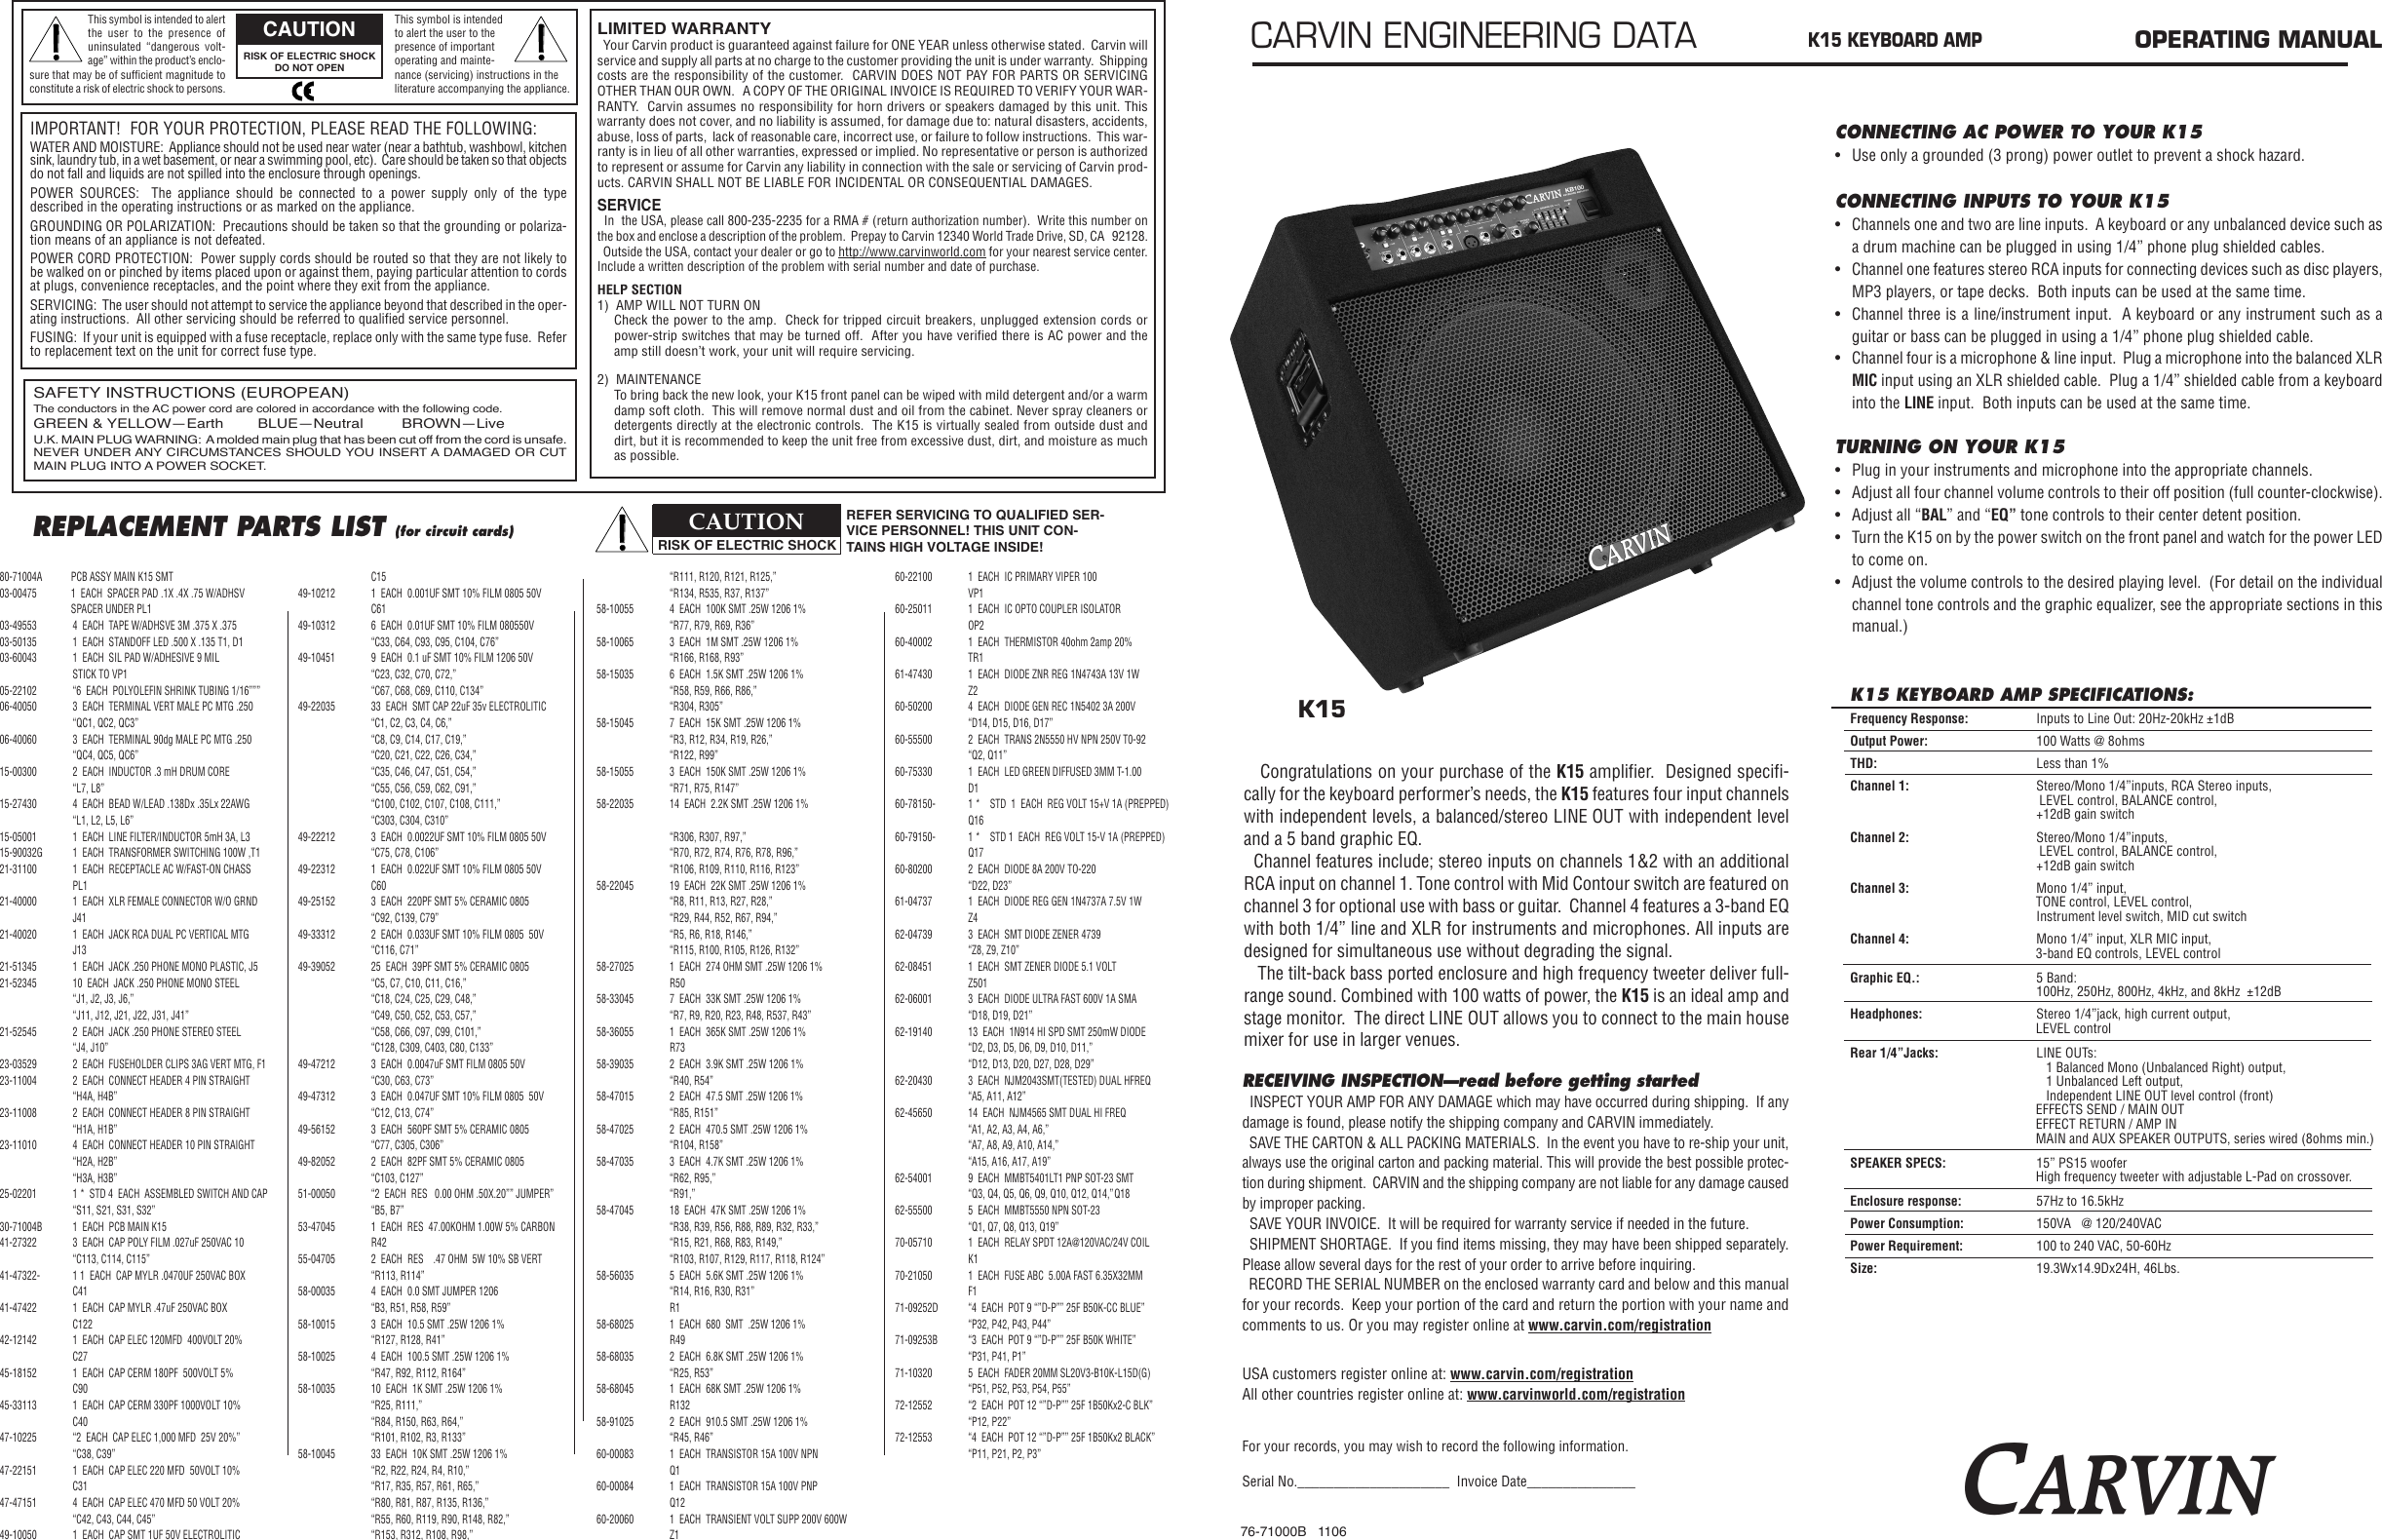 Viper c60 manual firearm manuals array carvin k15 owners manual 76 71000b rh usermanual wiki fandeluxe Images